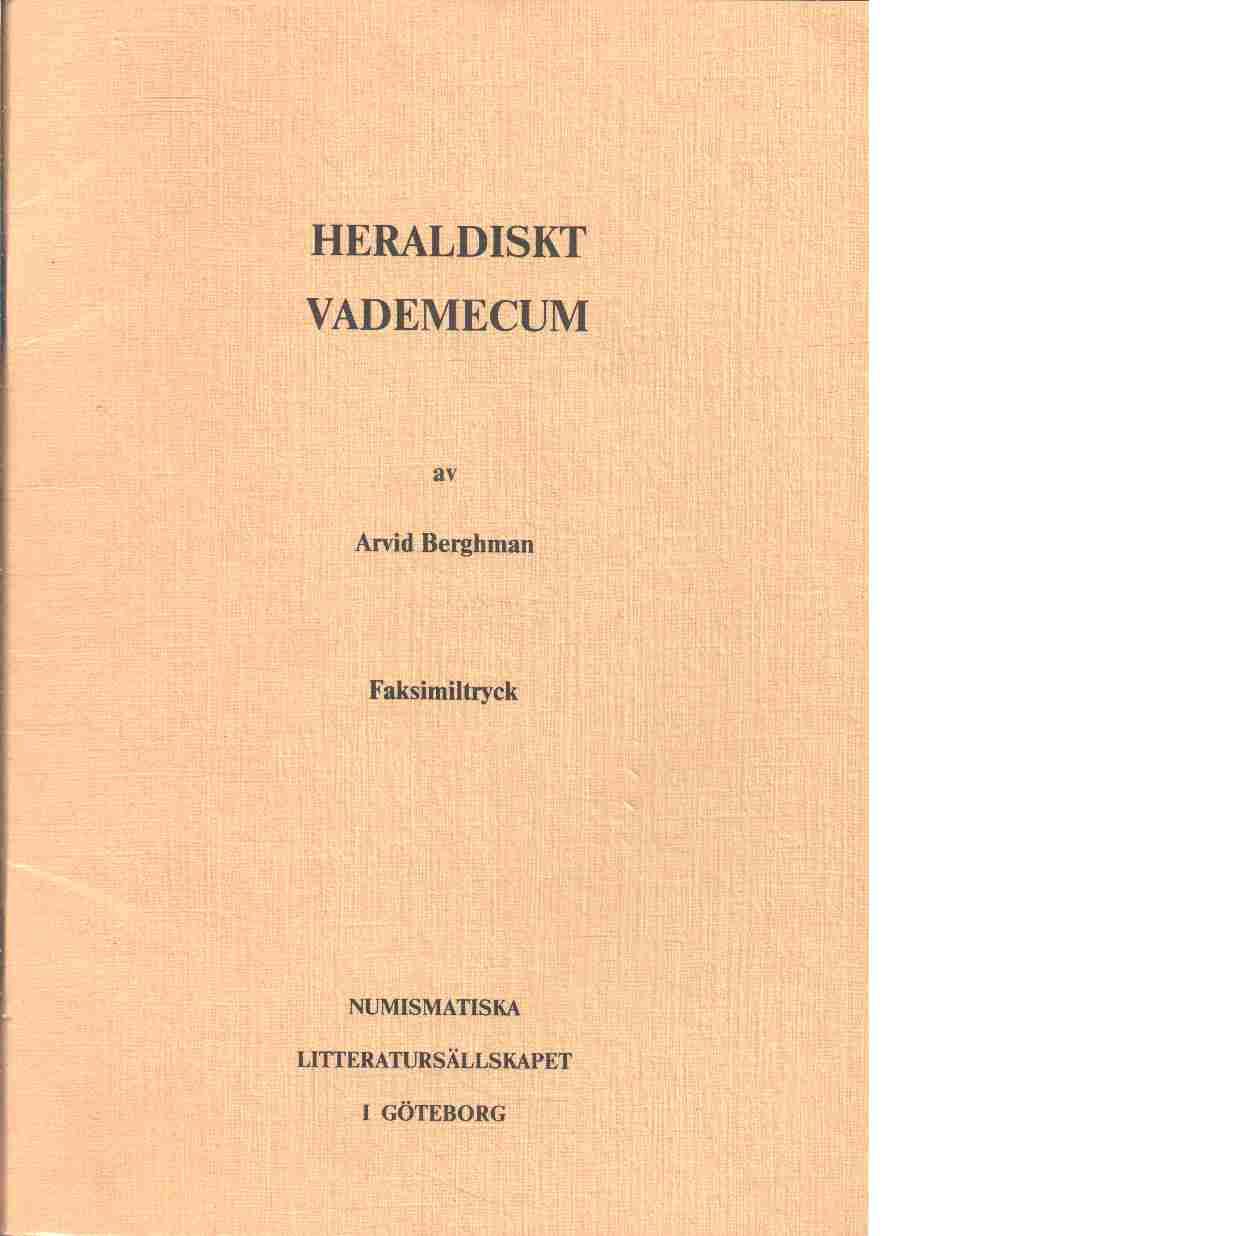 Heraldiskt vademecum - Berghman, Arvid